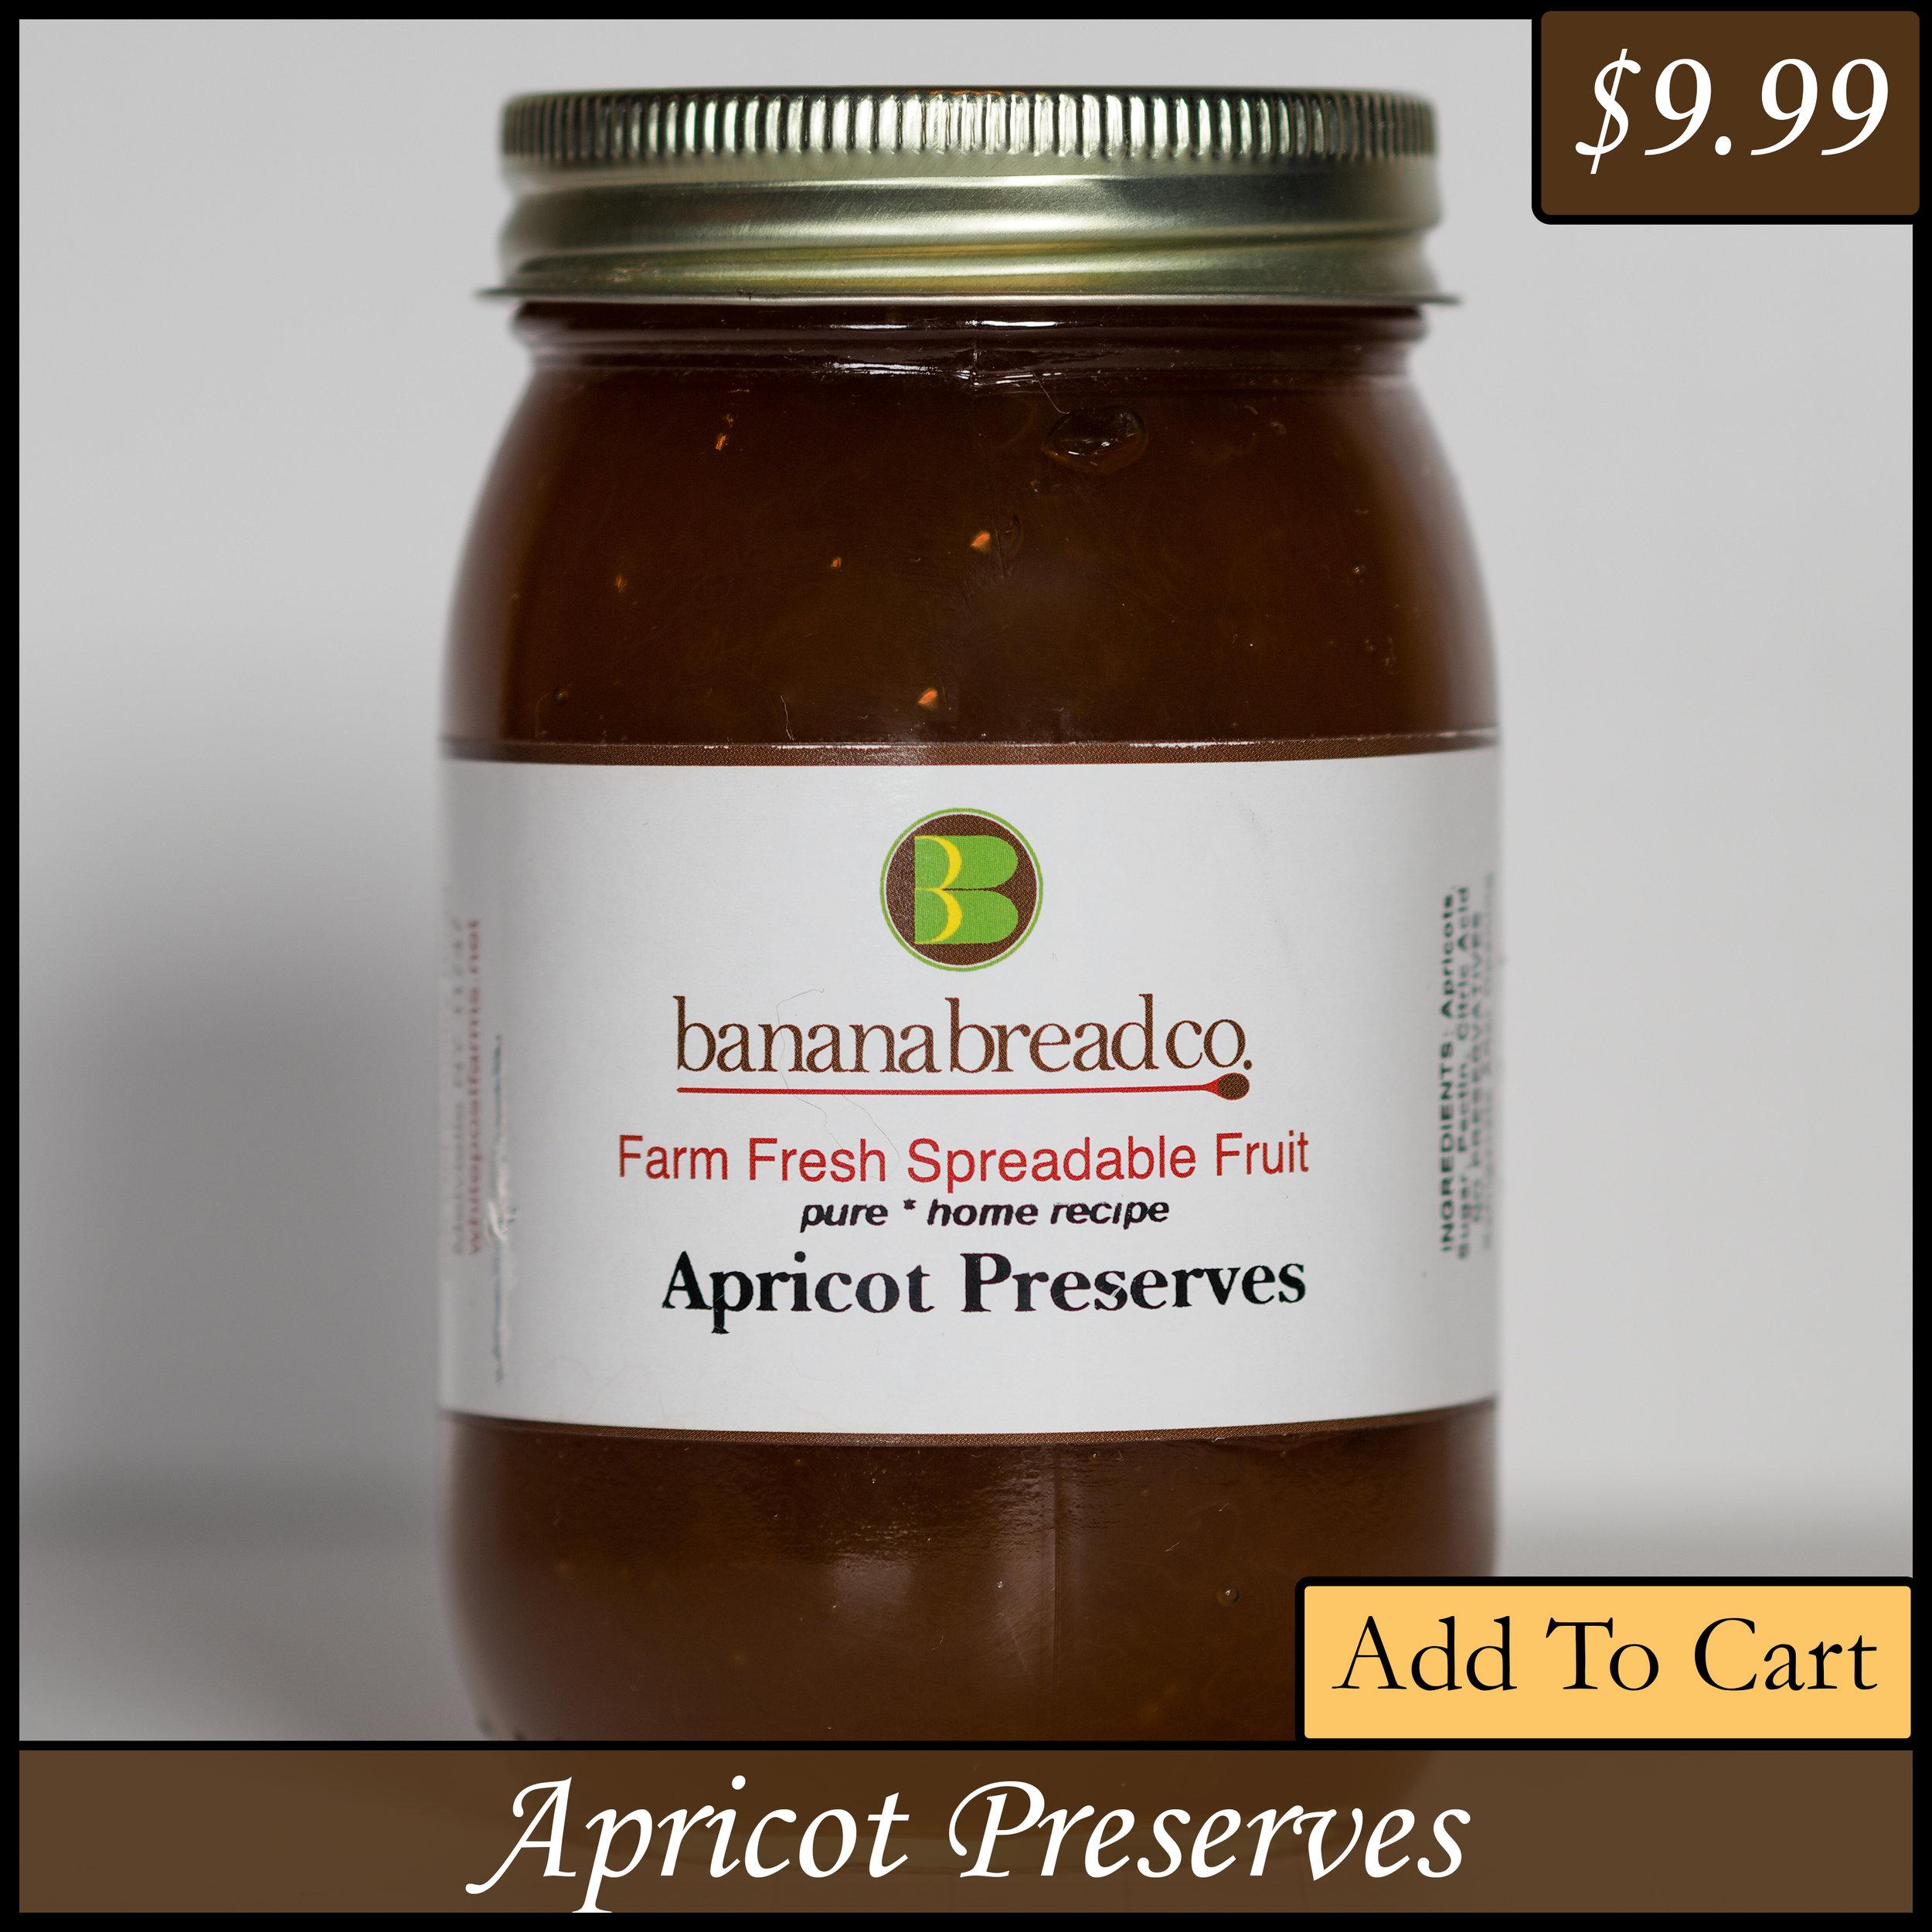 Apricot Preserves.jpg